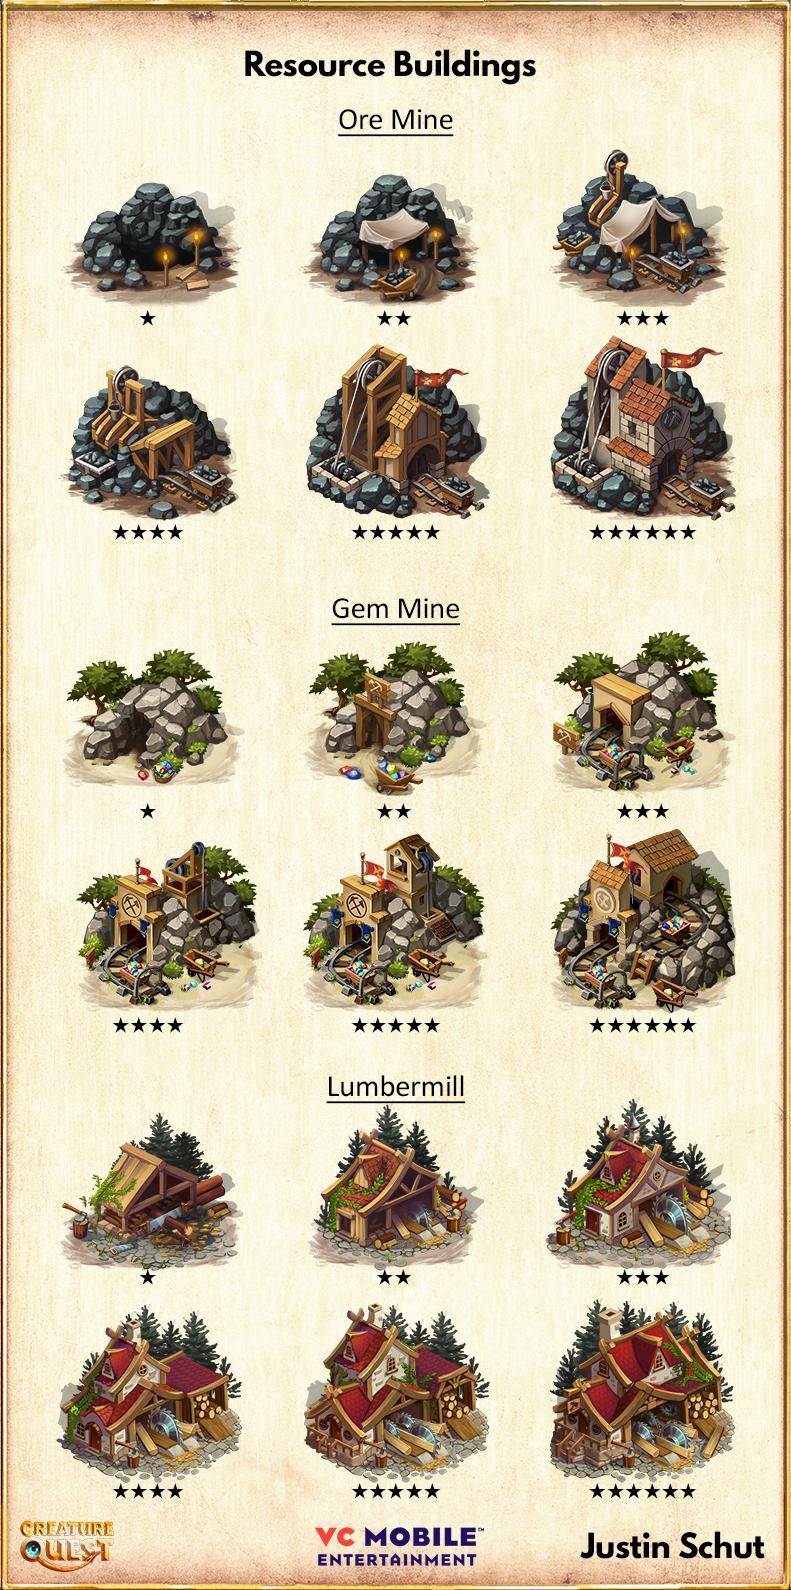 Resource Buildings